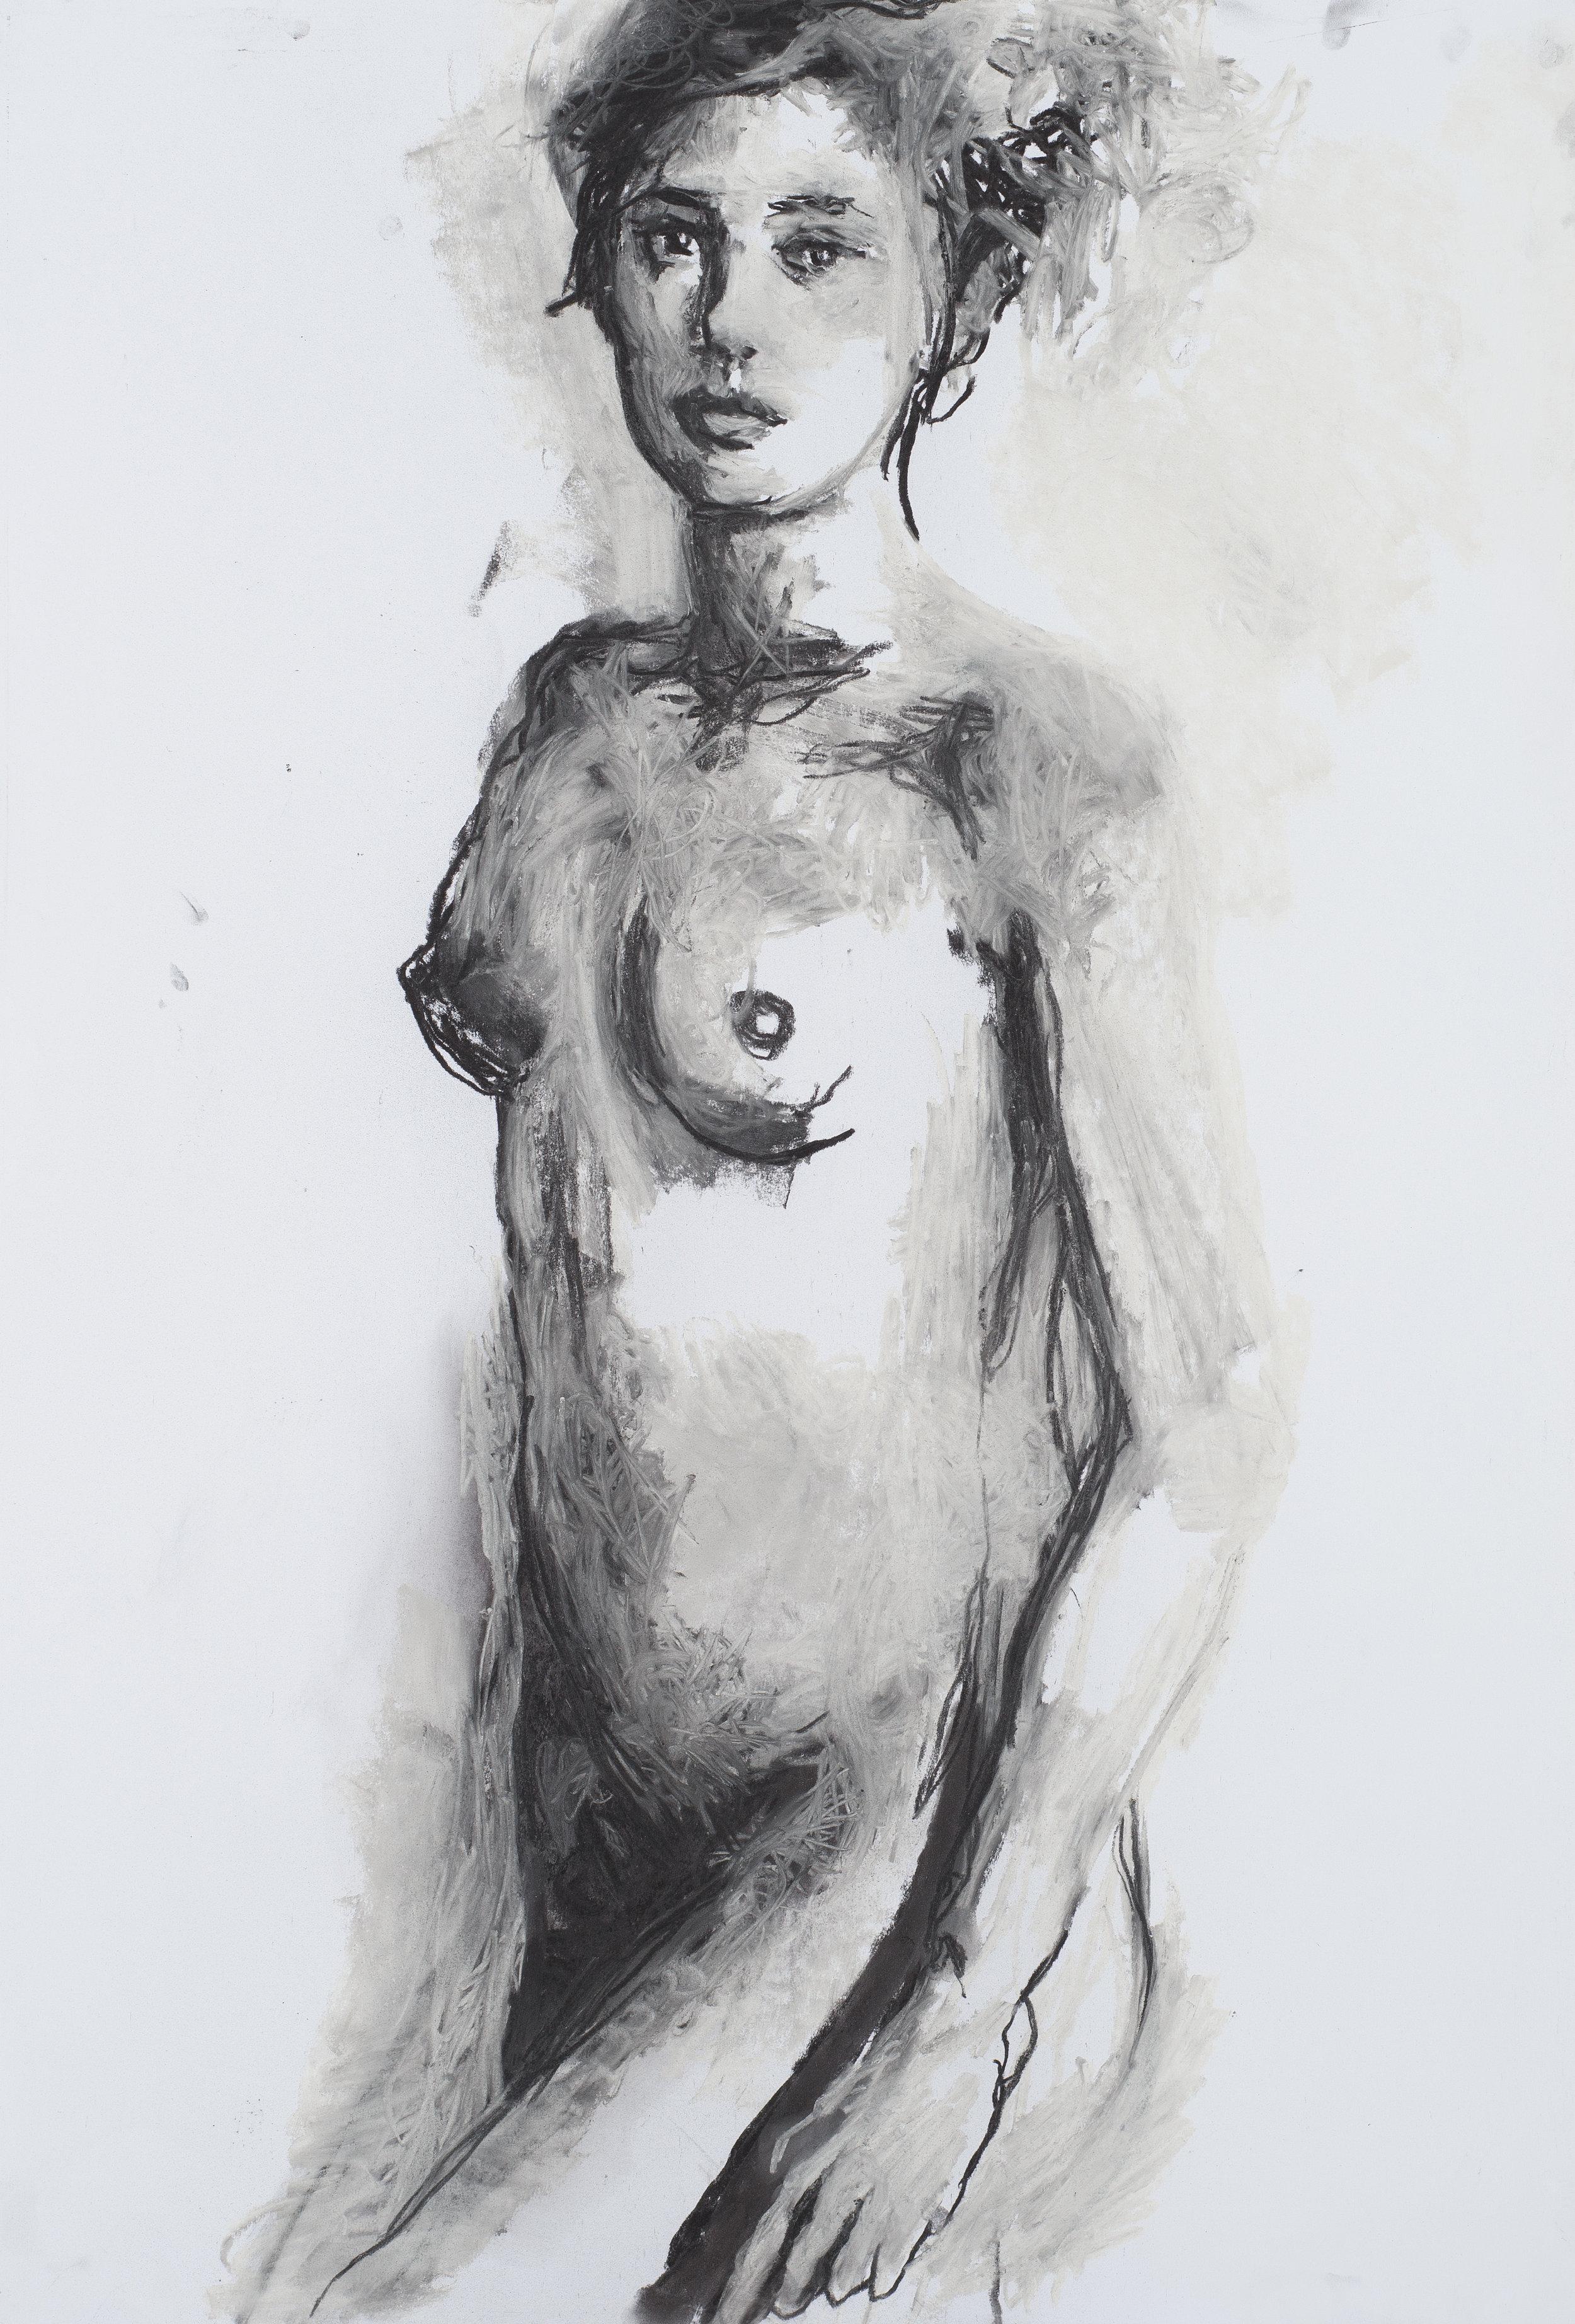 Eros couronné de roses 4 - 201675 x 110 cm